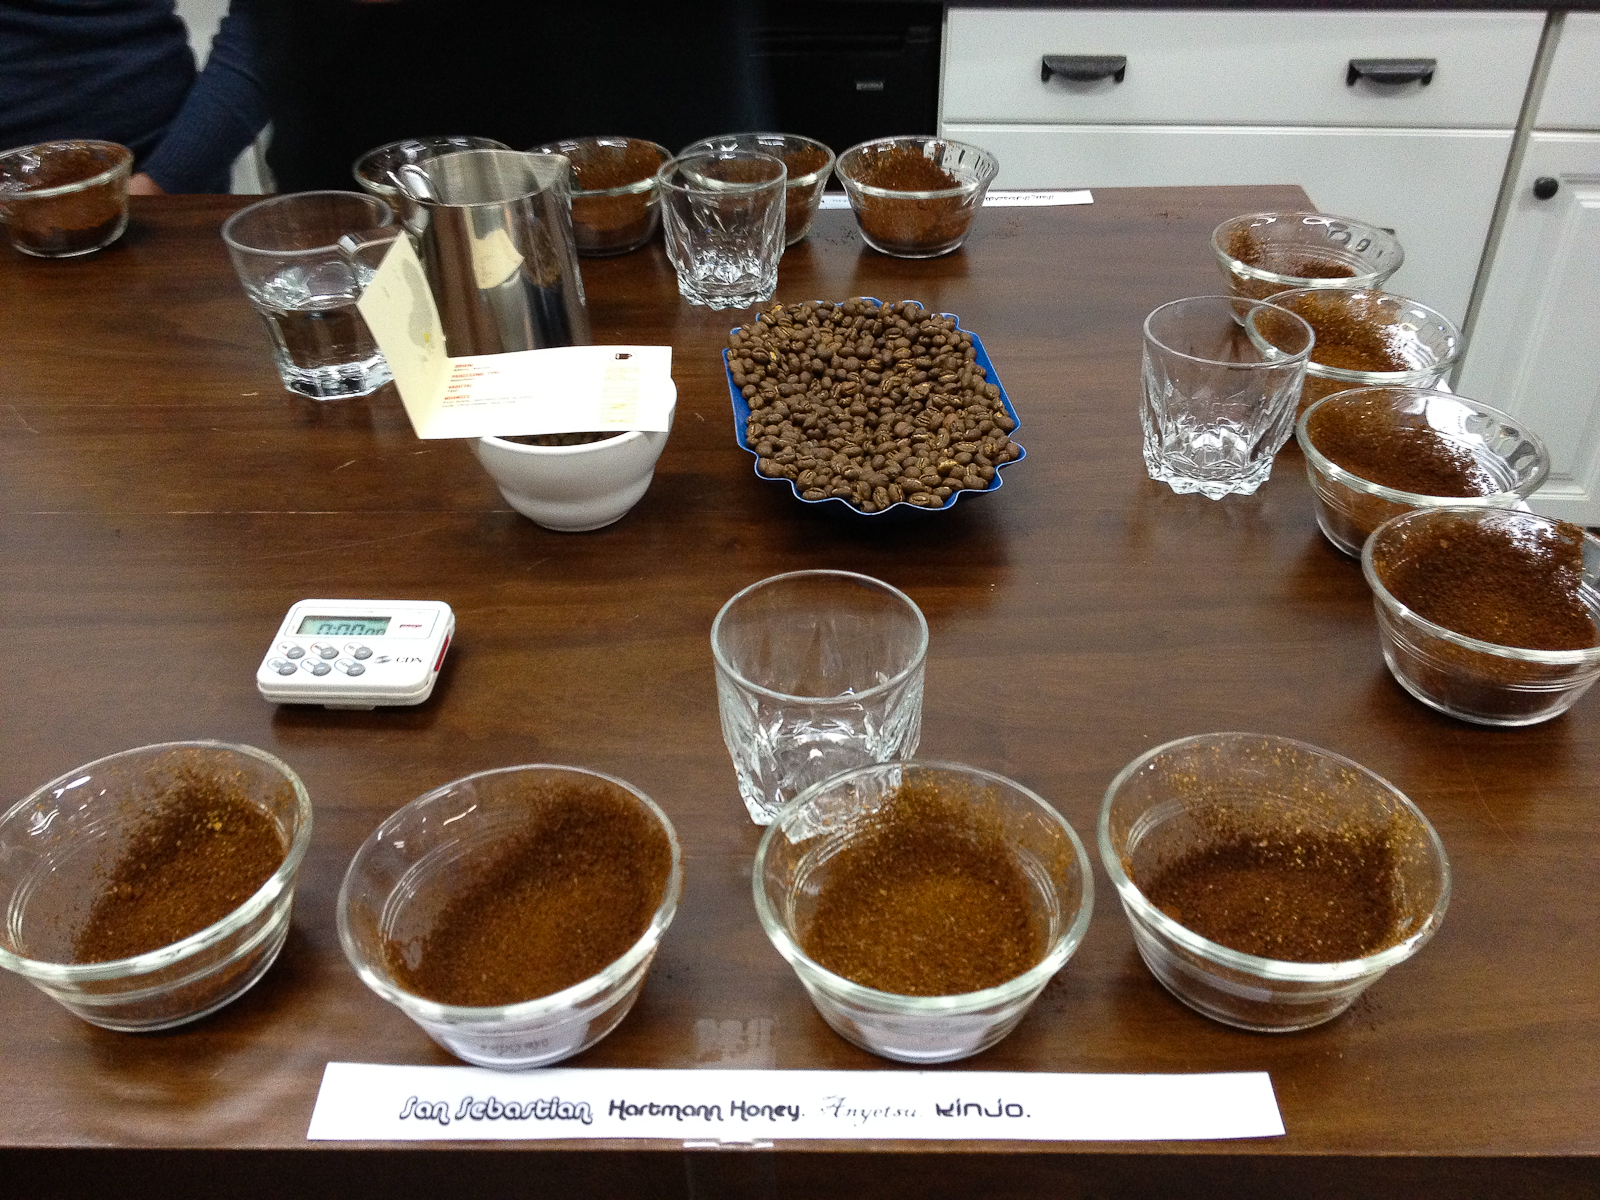 Cupping: San sebastian, Hartmann Honey, Anyetsu, Kinjo